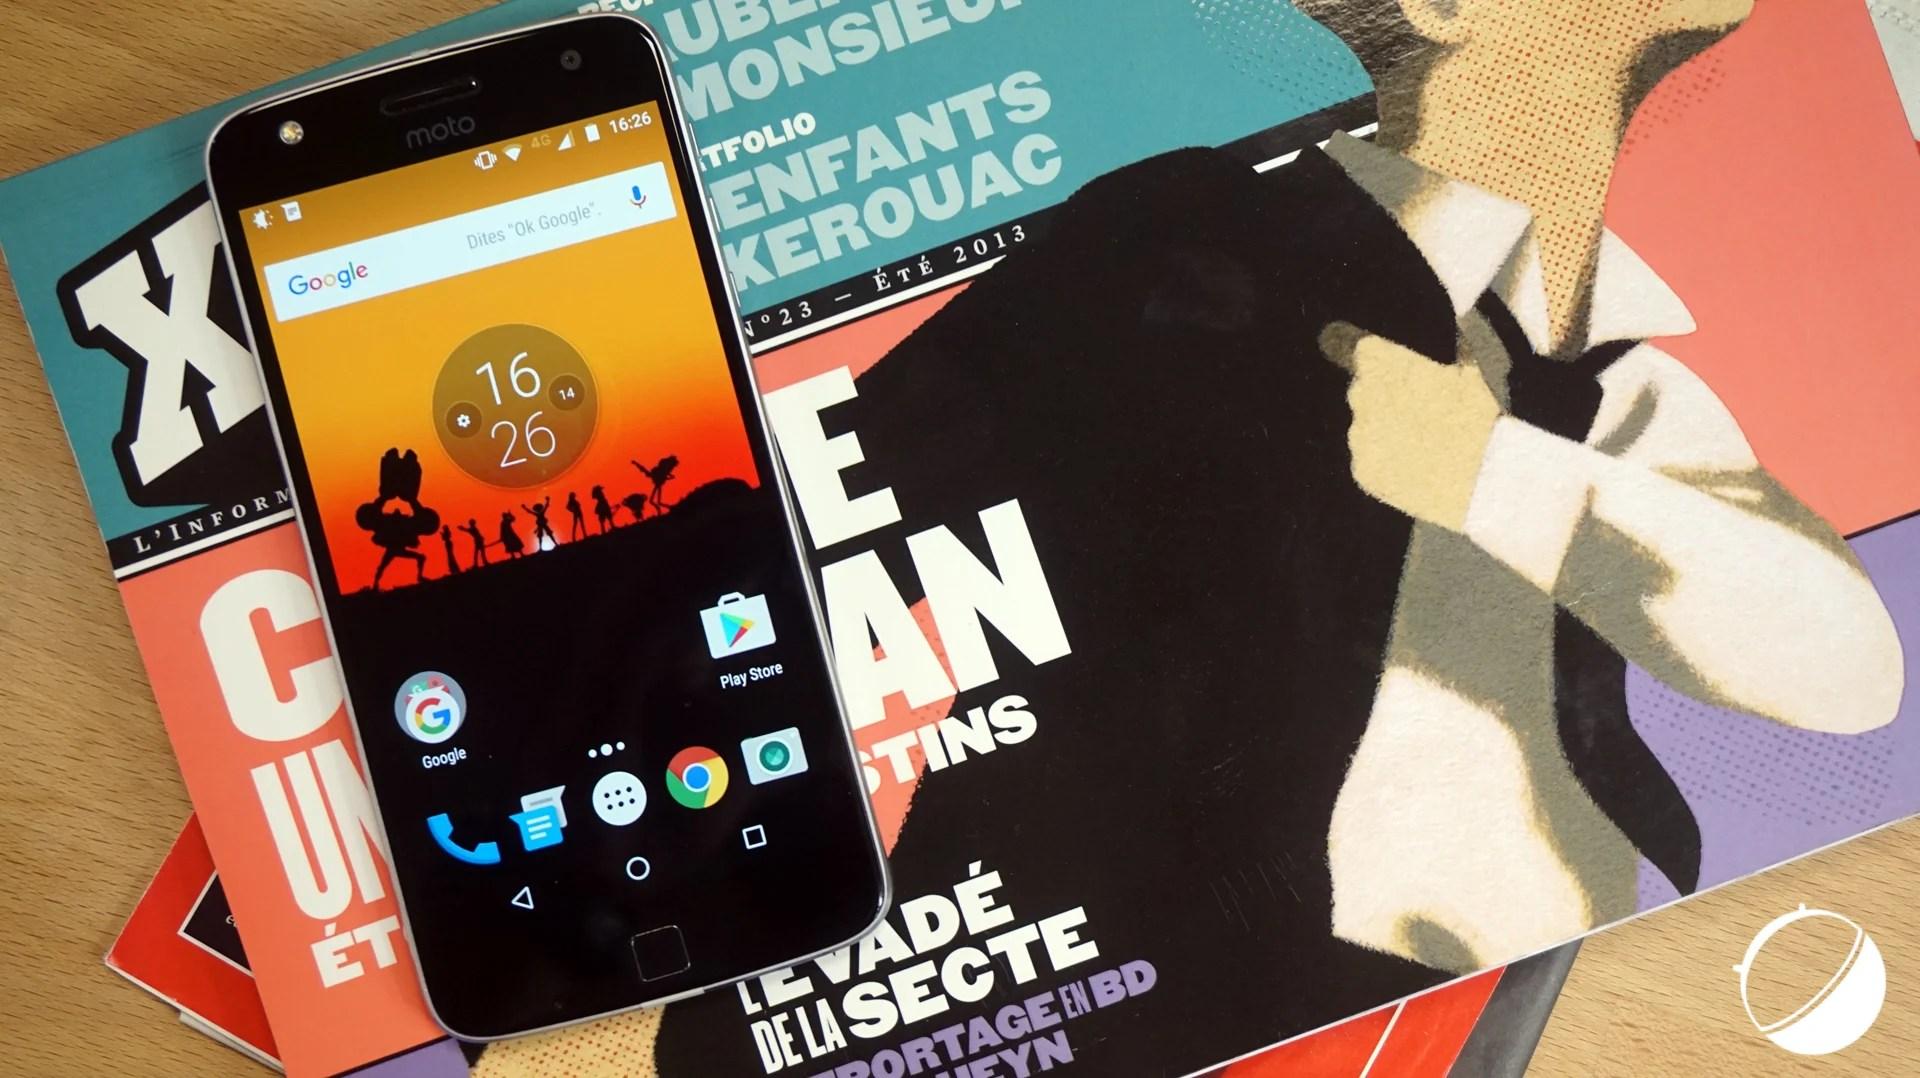 Lenovo Moto Z Play : Tout ce qu'il faut savoir